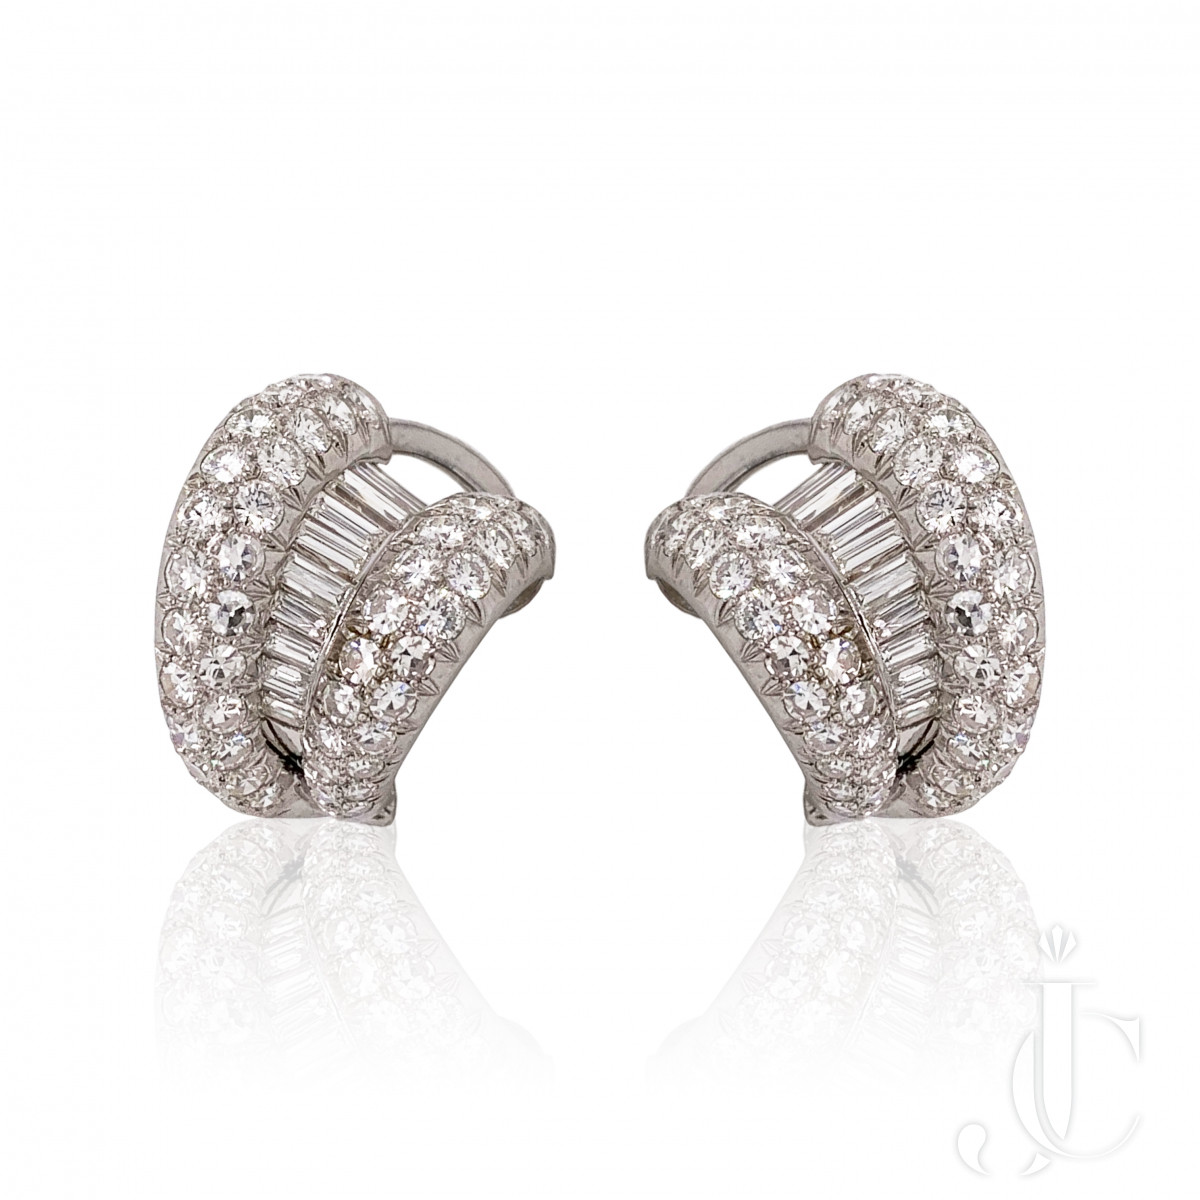 1960s Platinum Diamond Earrings